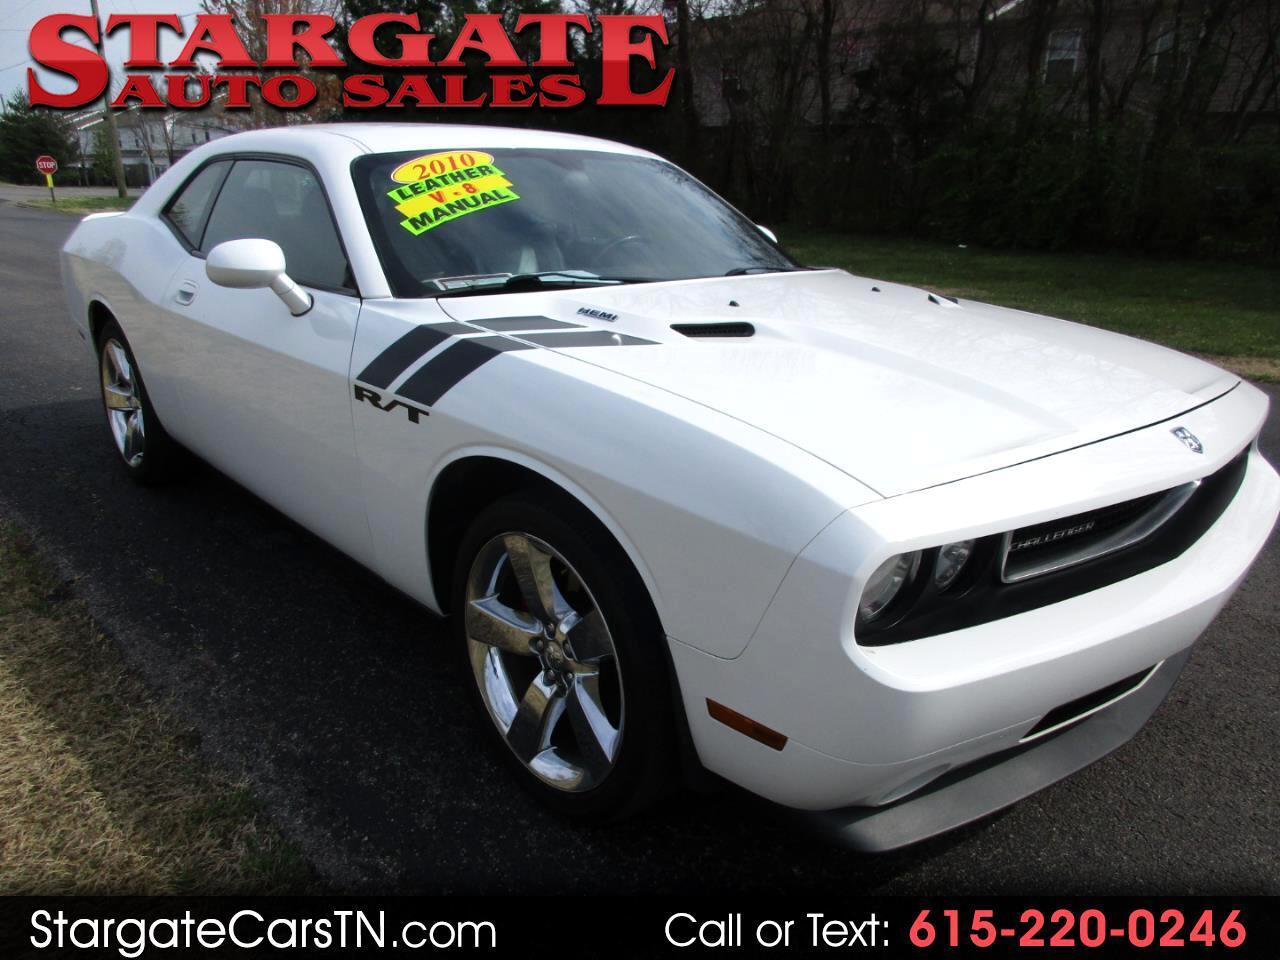 2010 Dodge Challenger 2dr Cpe R/T